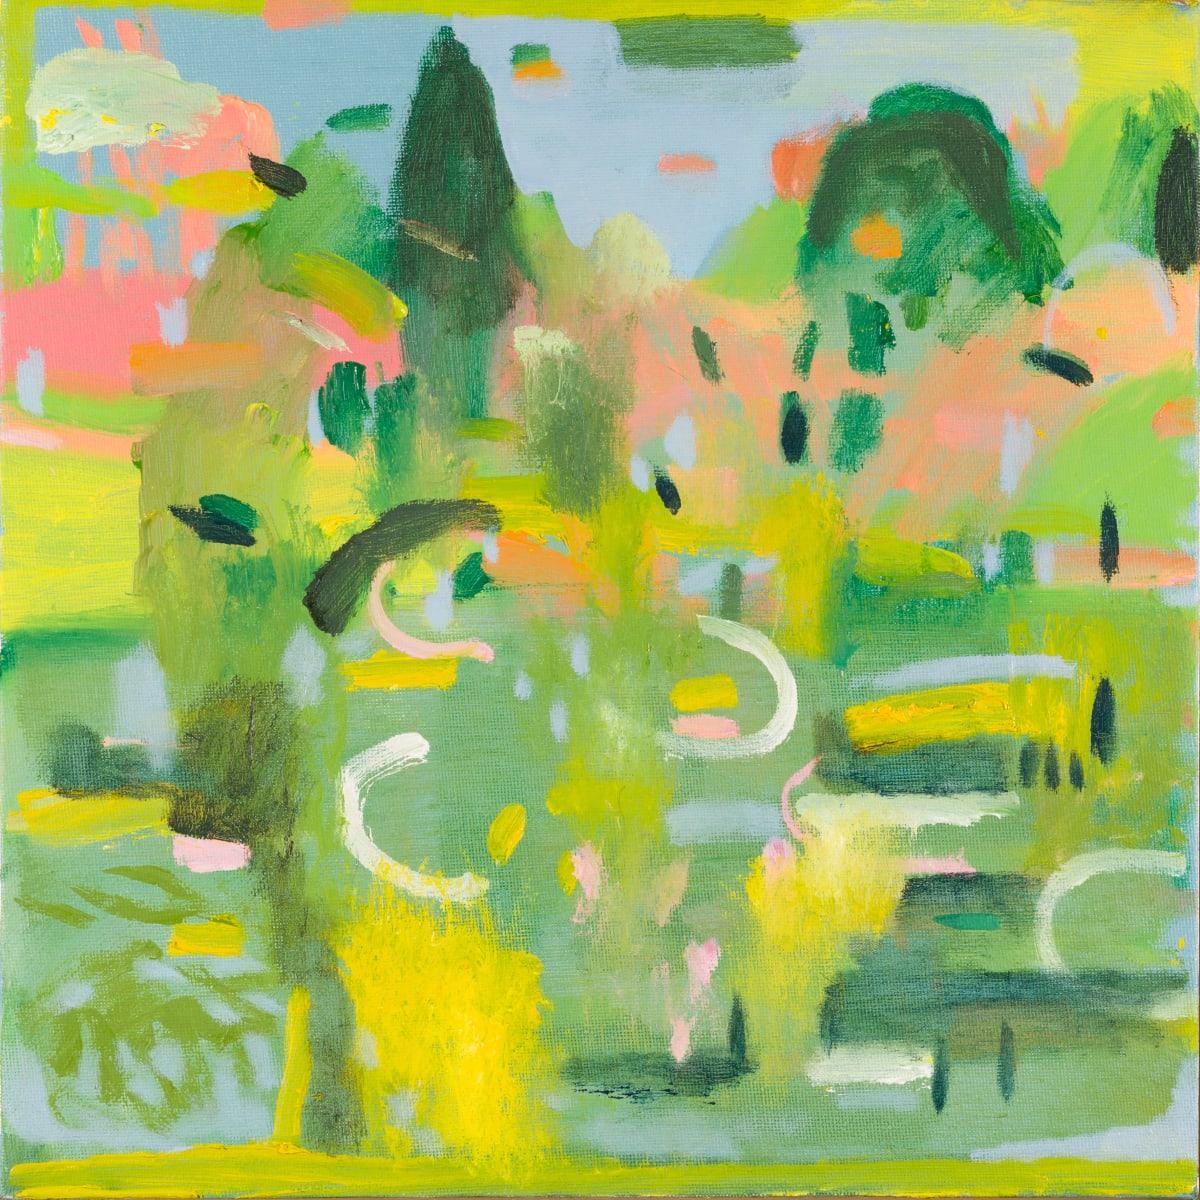 Katie Sollohub, Sheffield Park Pink, Green, Yellow, 2015